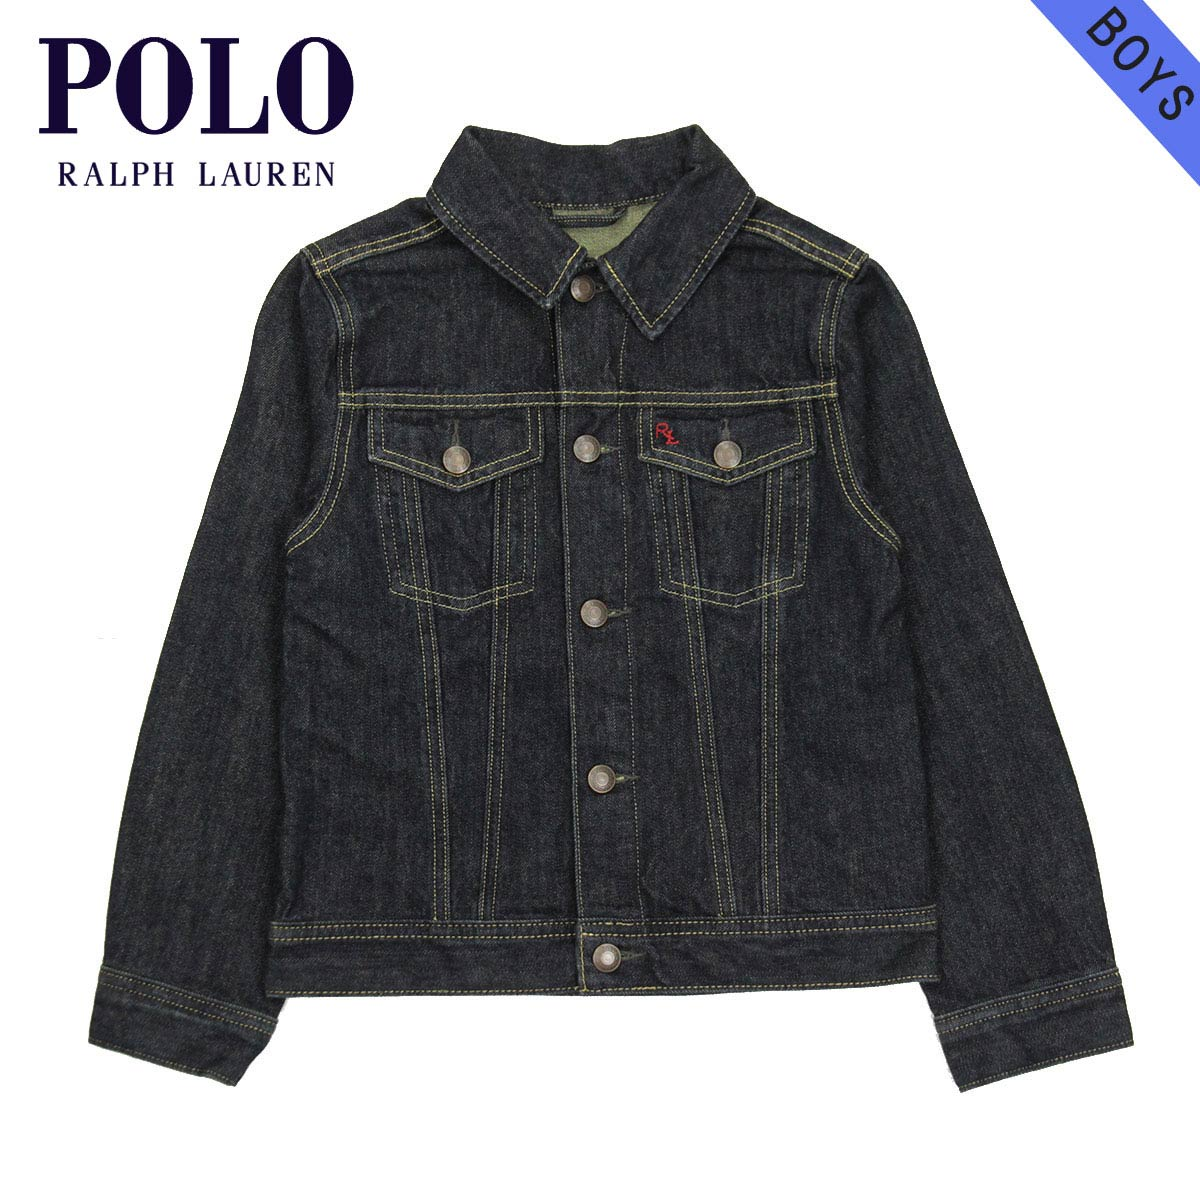 580853069b1a2 Poloralflorenkids POLO RALPH LAUREN CHILDREN genuine kids clothing boys  jacket Classic Trucker Jean Jacket  22358446 NAVY 10P22Jul14